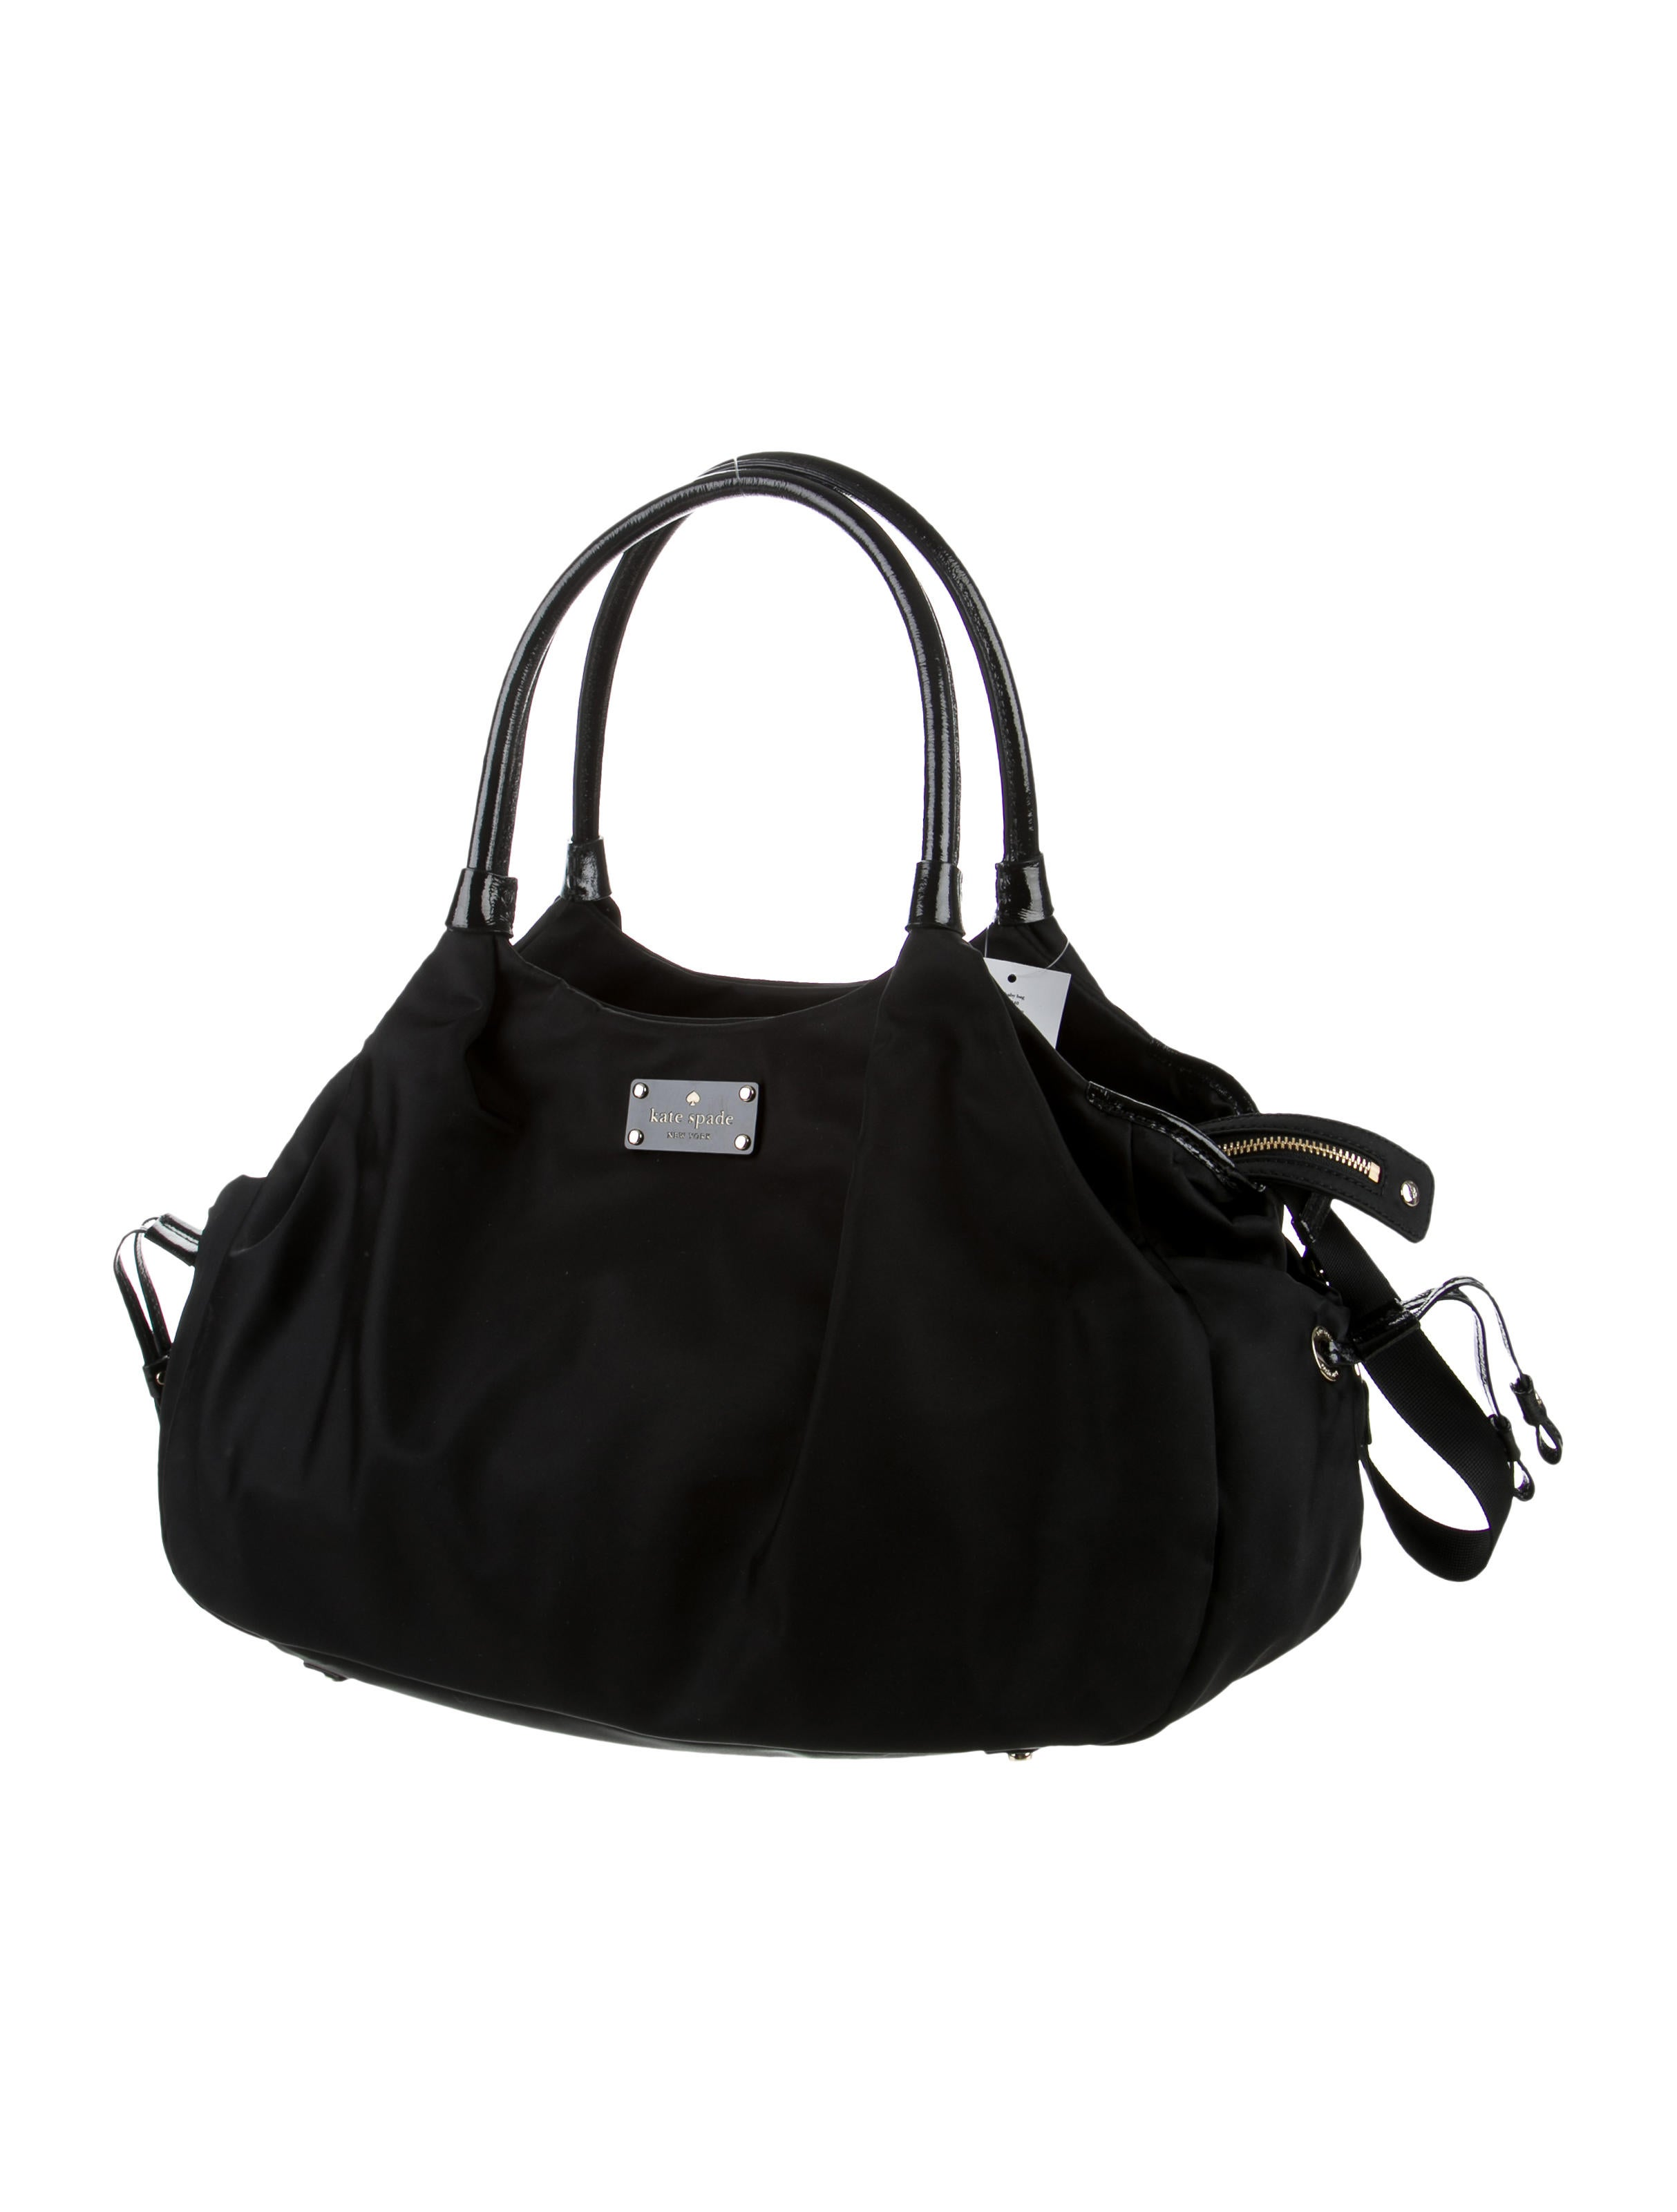 kate spade new york diaper bag w tags handbags wka39415 the realreal. Black Bedroom Furniture Sets. Home Design Ideas